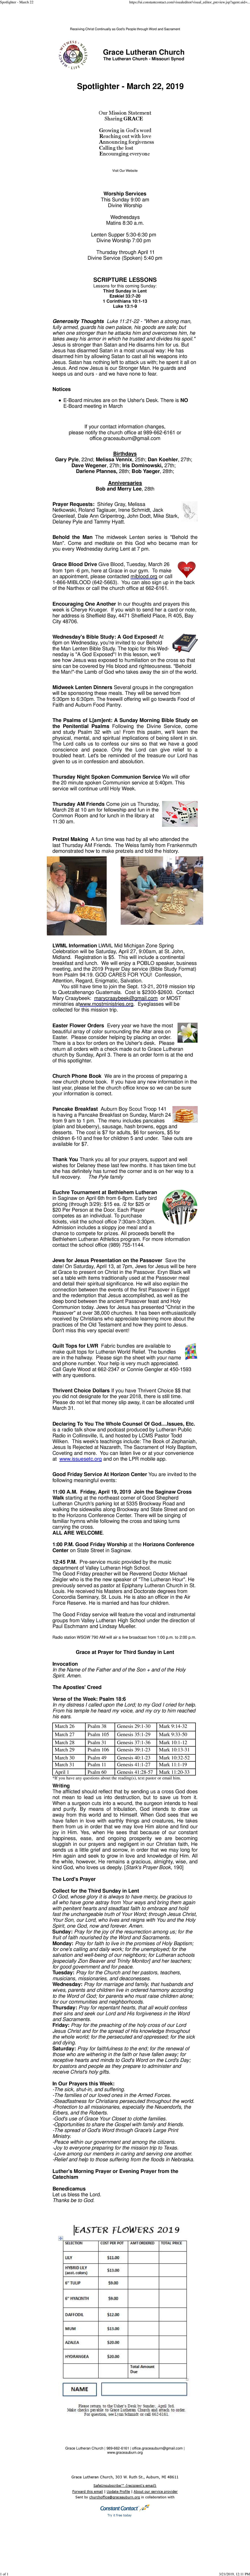 Spotlighter - March 22-page-001.jpg